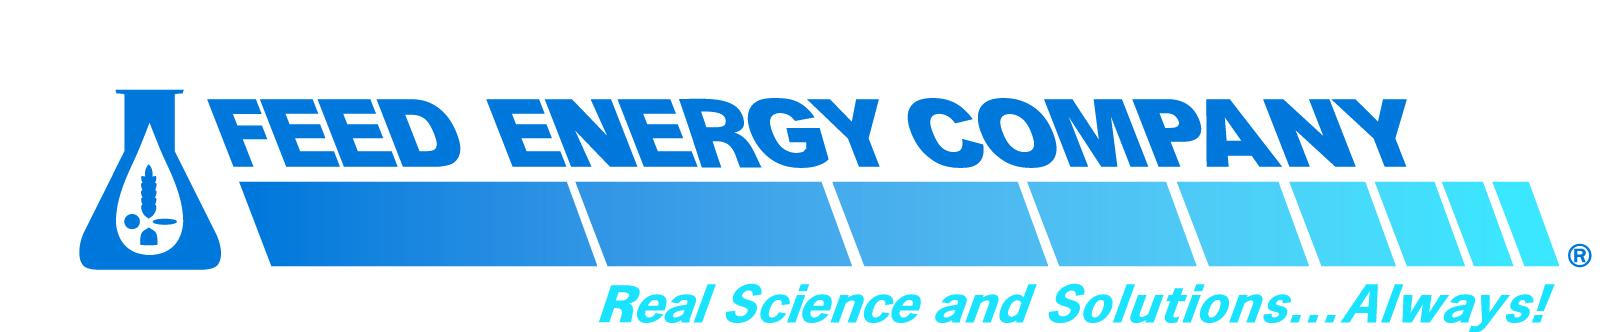 Feed Energy Company Logo - With ®.jpg